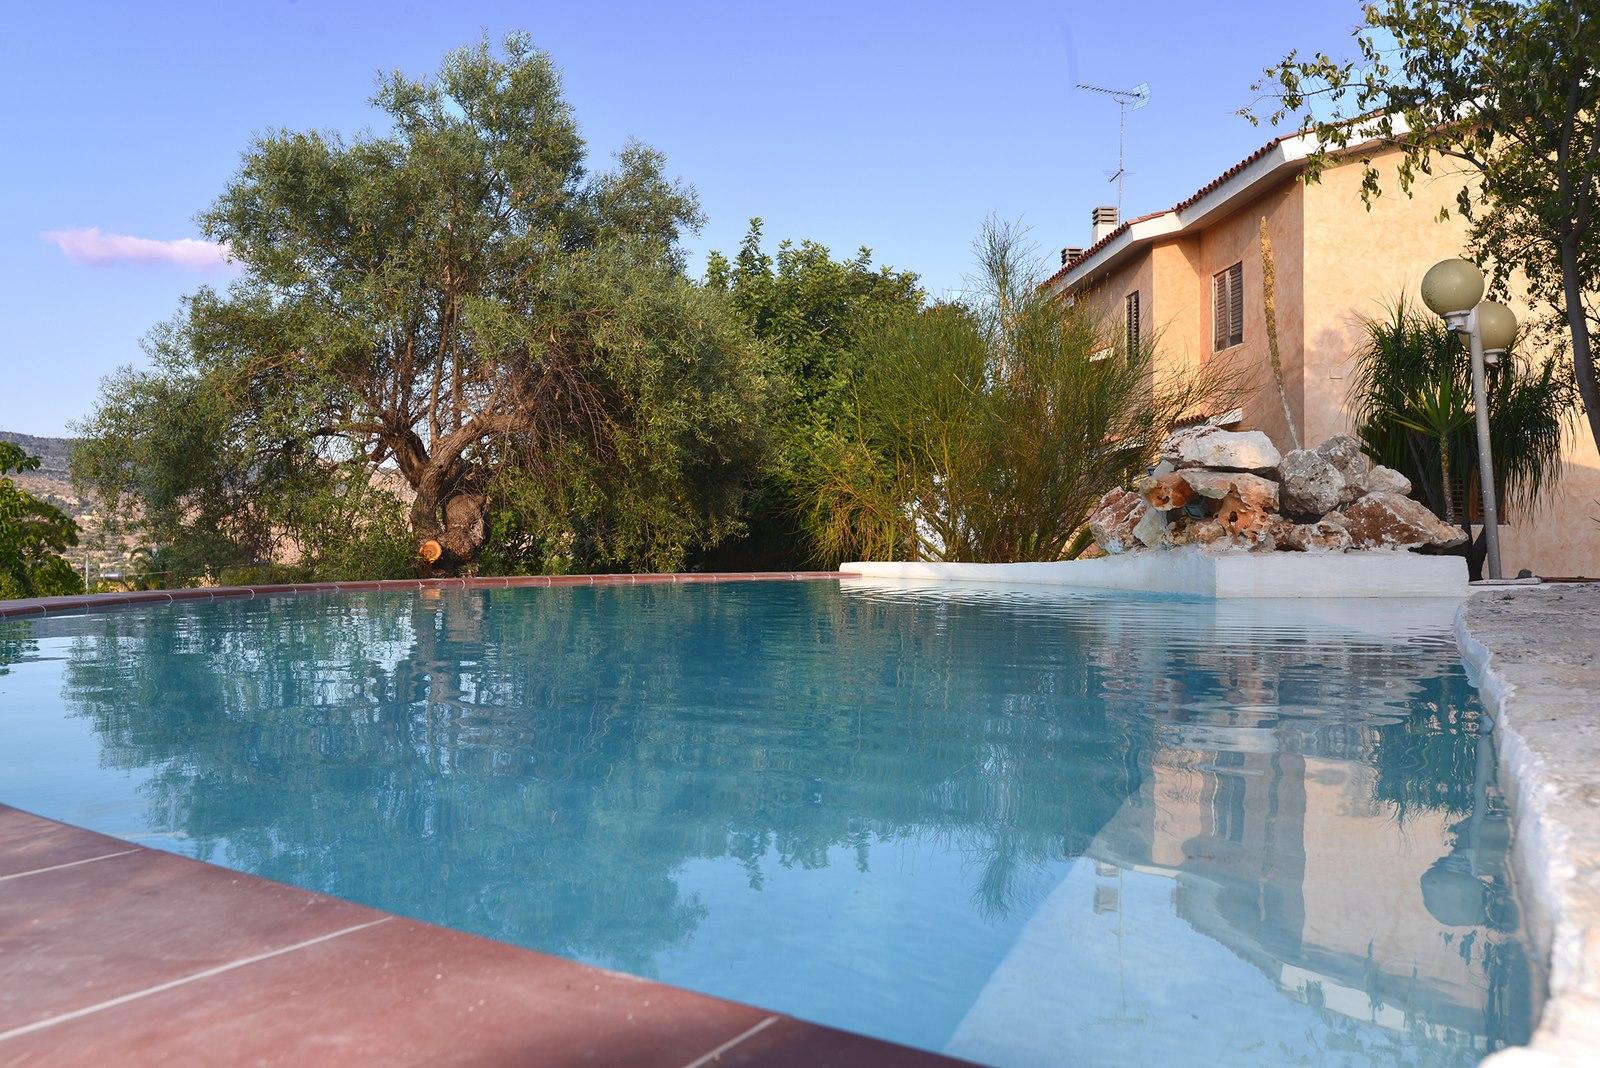 Maison de vacances Villa Casa (1531407), Solarino, Siracusa, Sicile, Italie, image 25